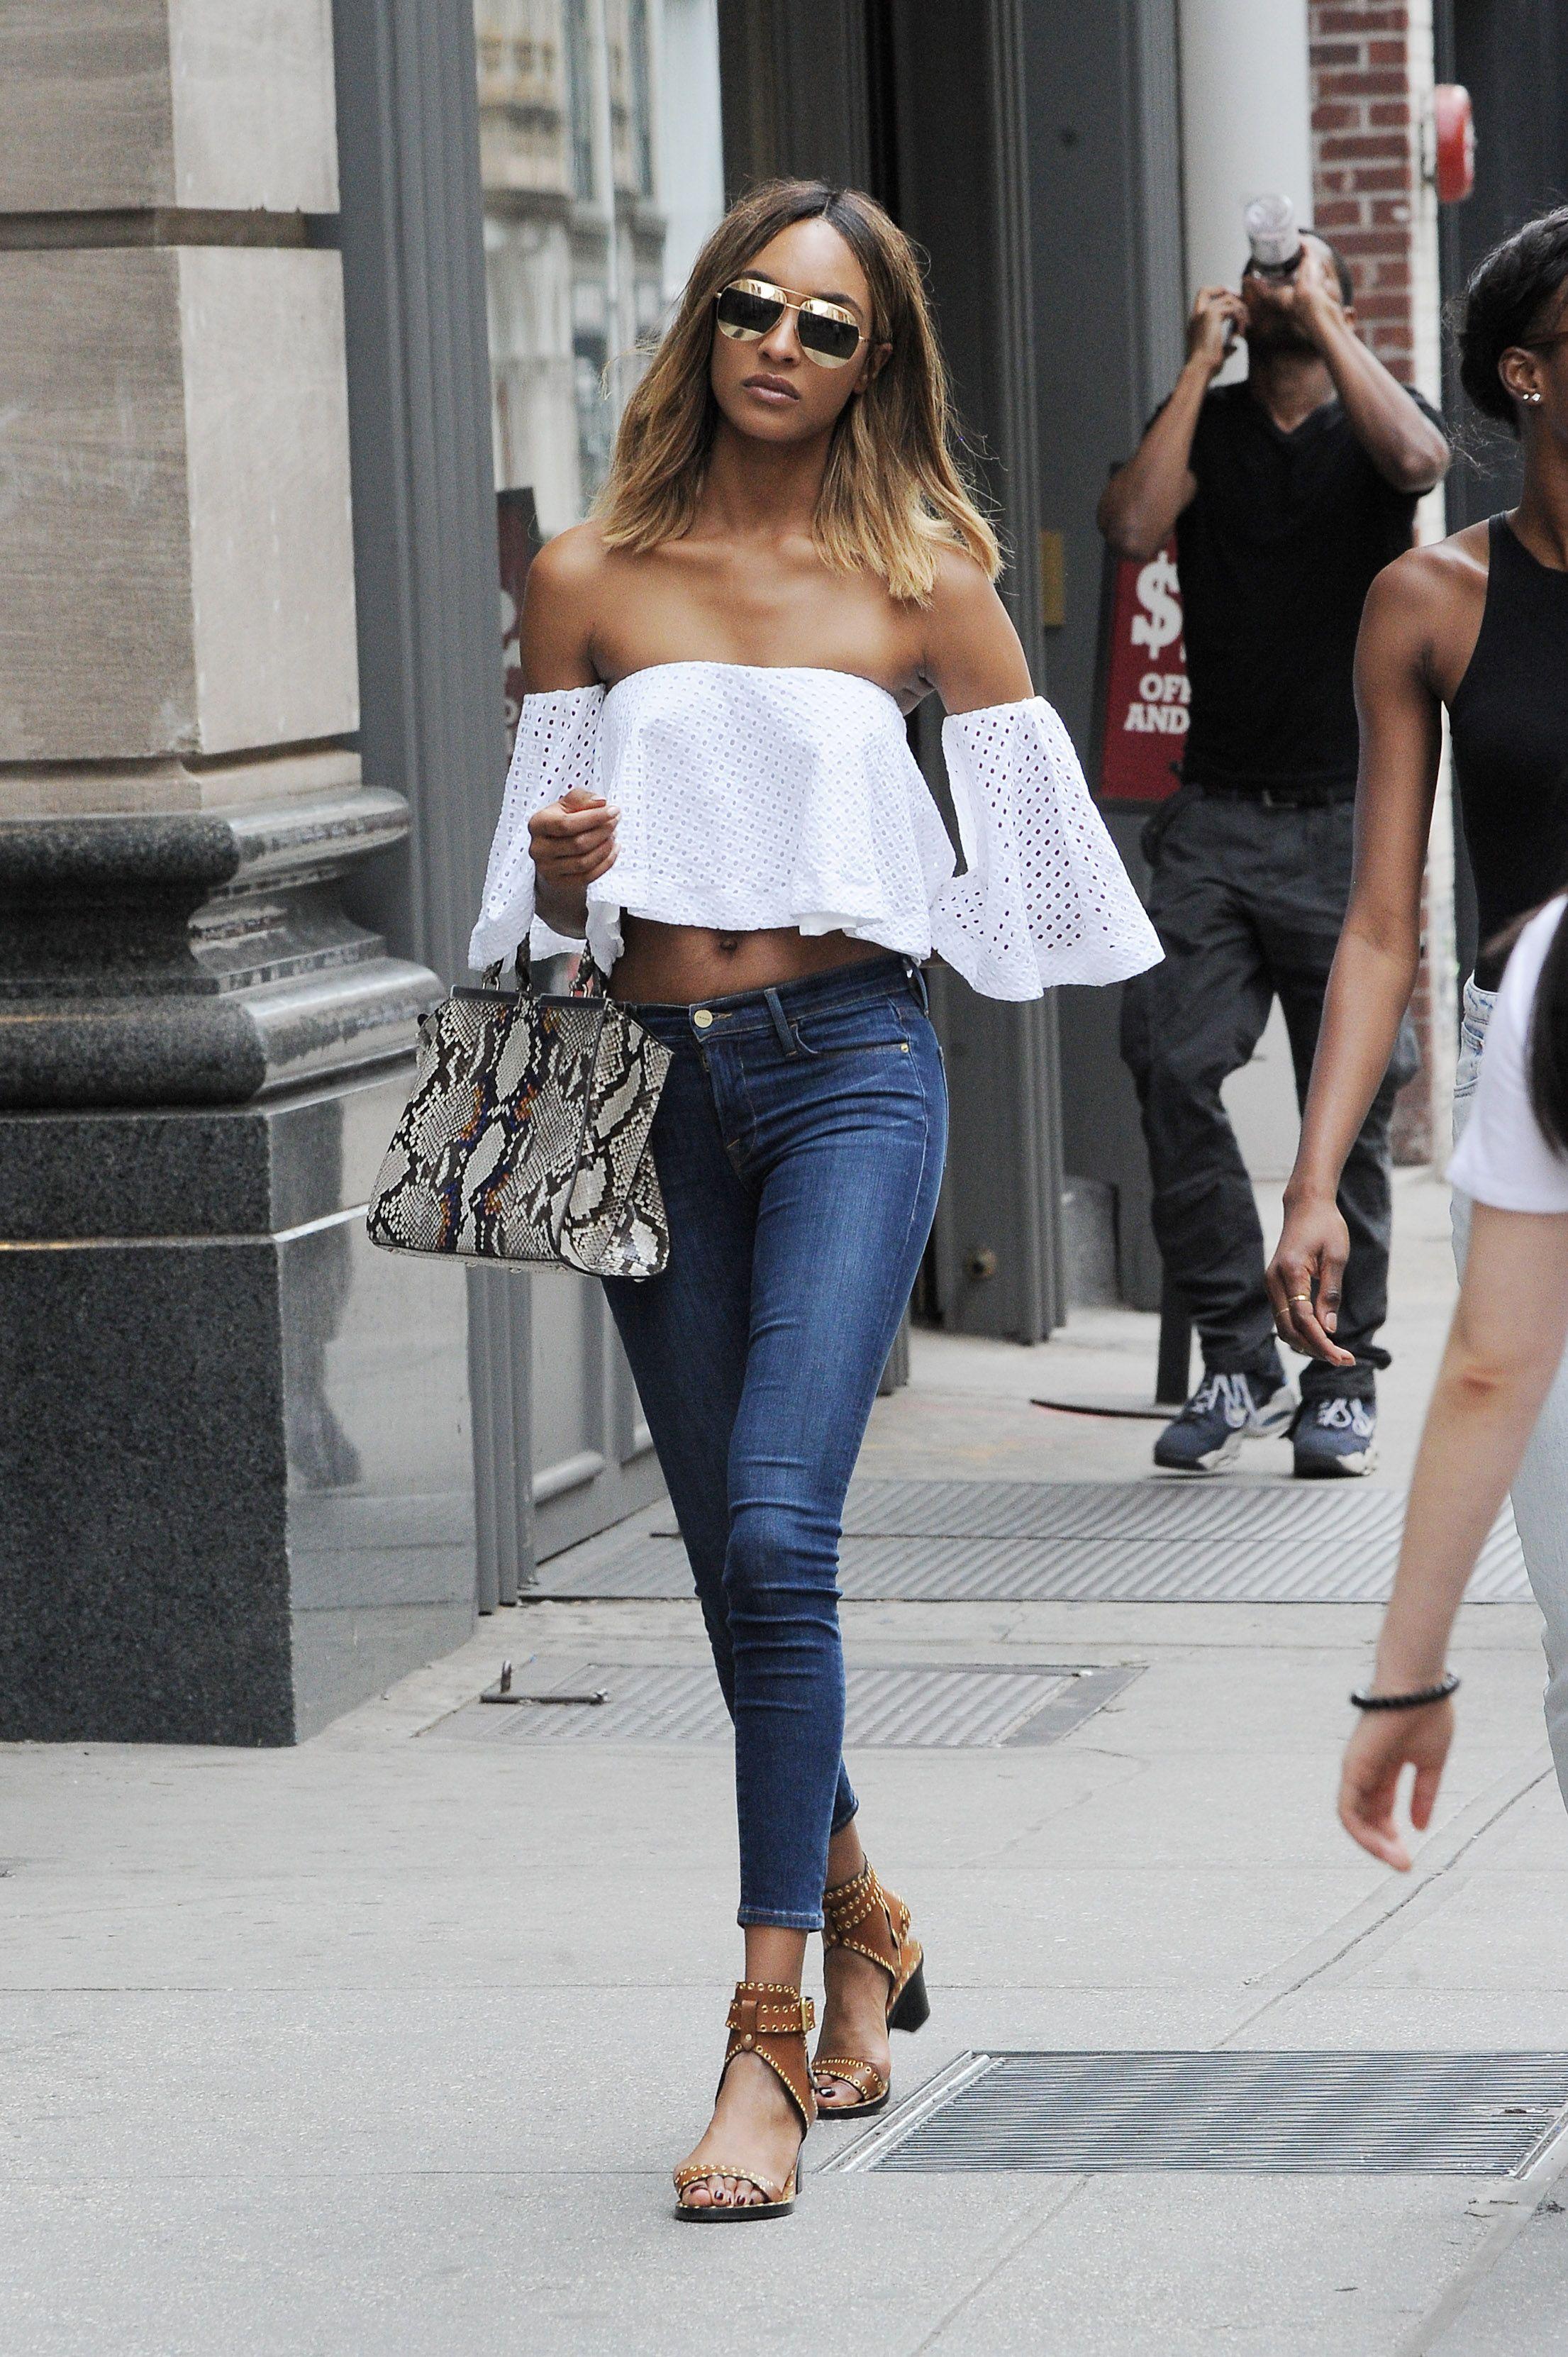 Jourdan Dunn Looks Ready For Summer In Her Blue Jeans